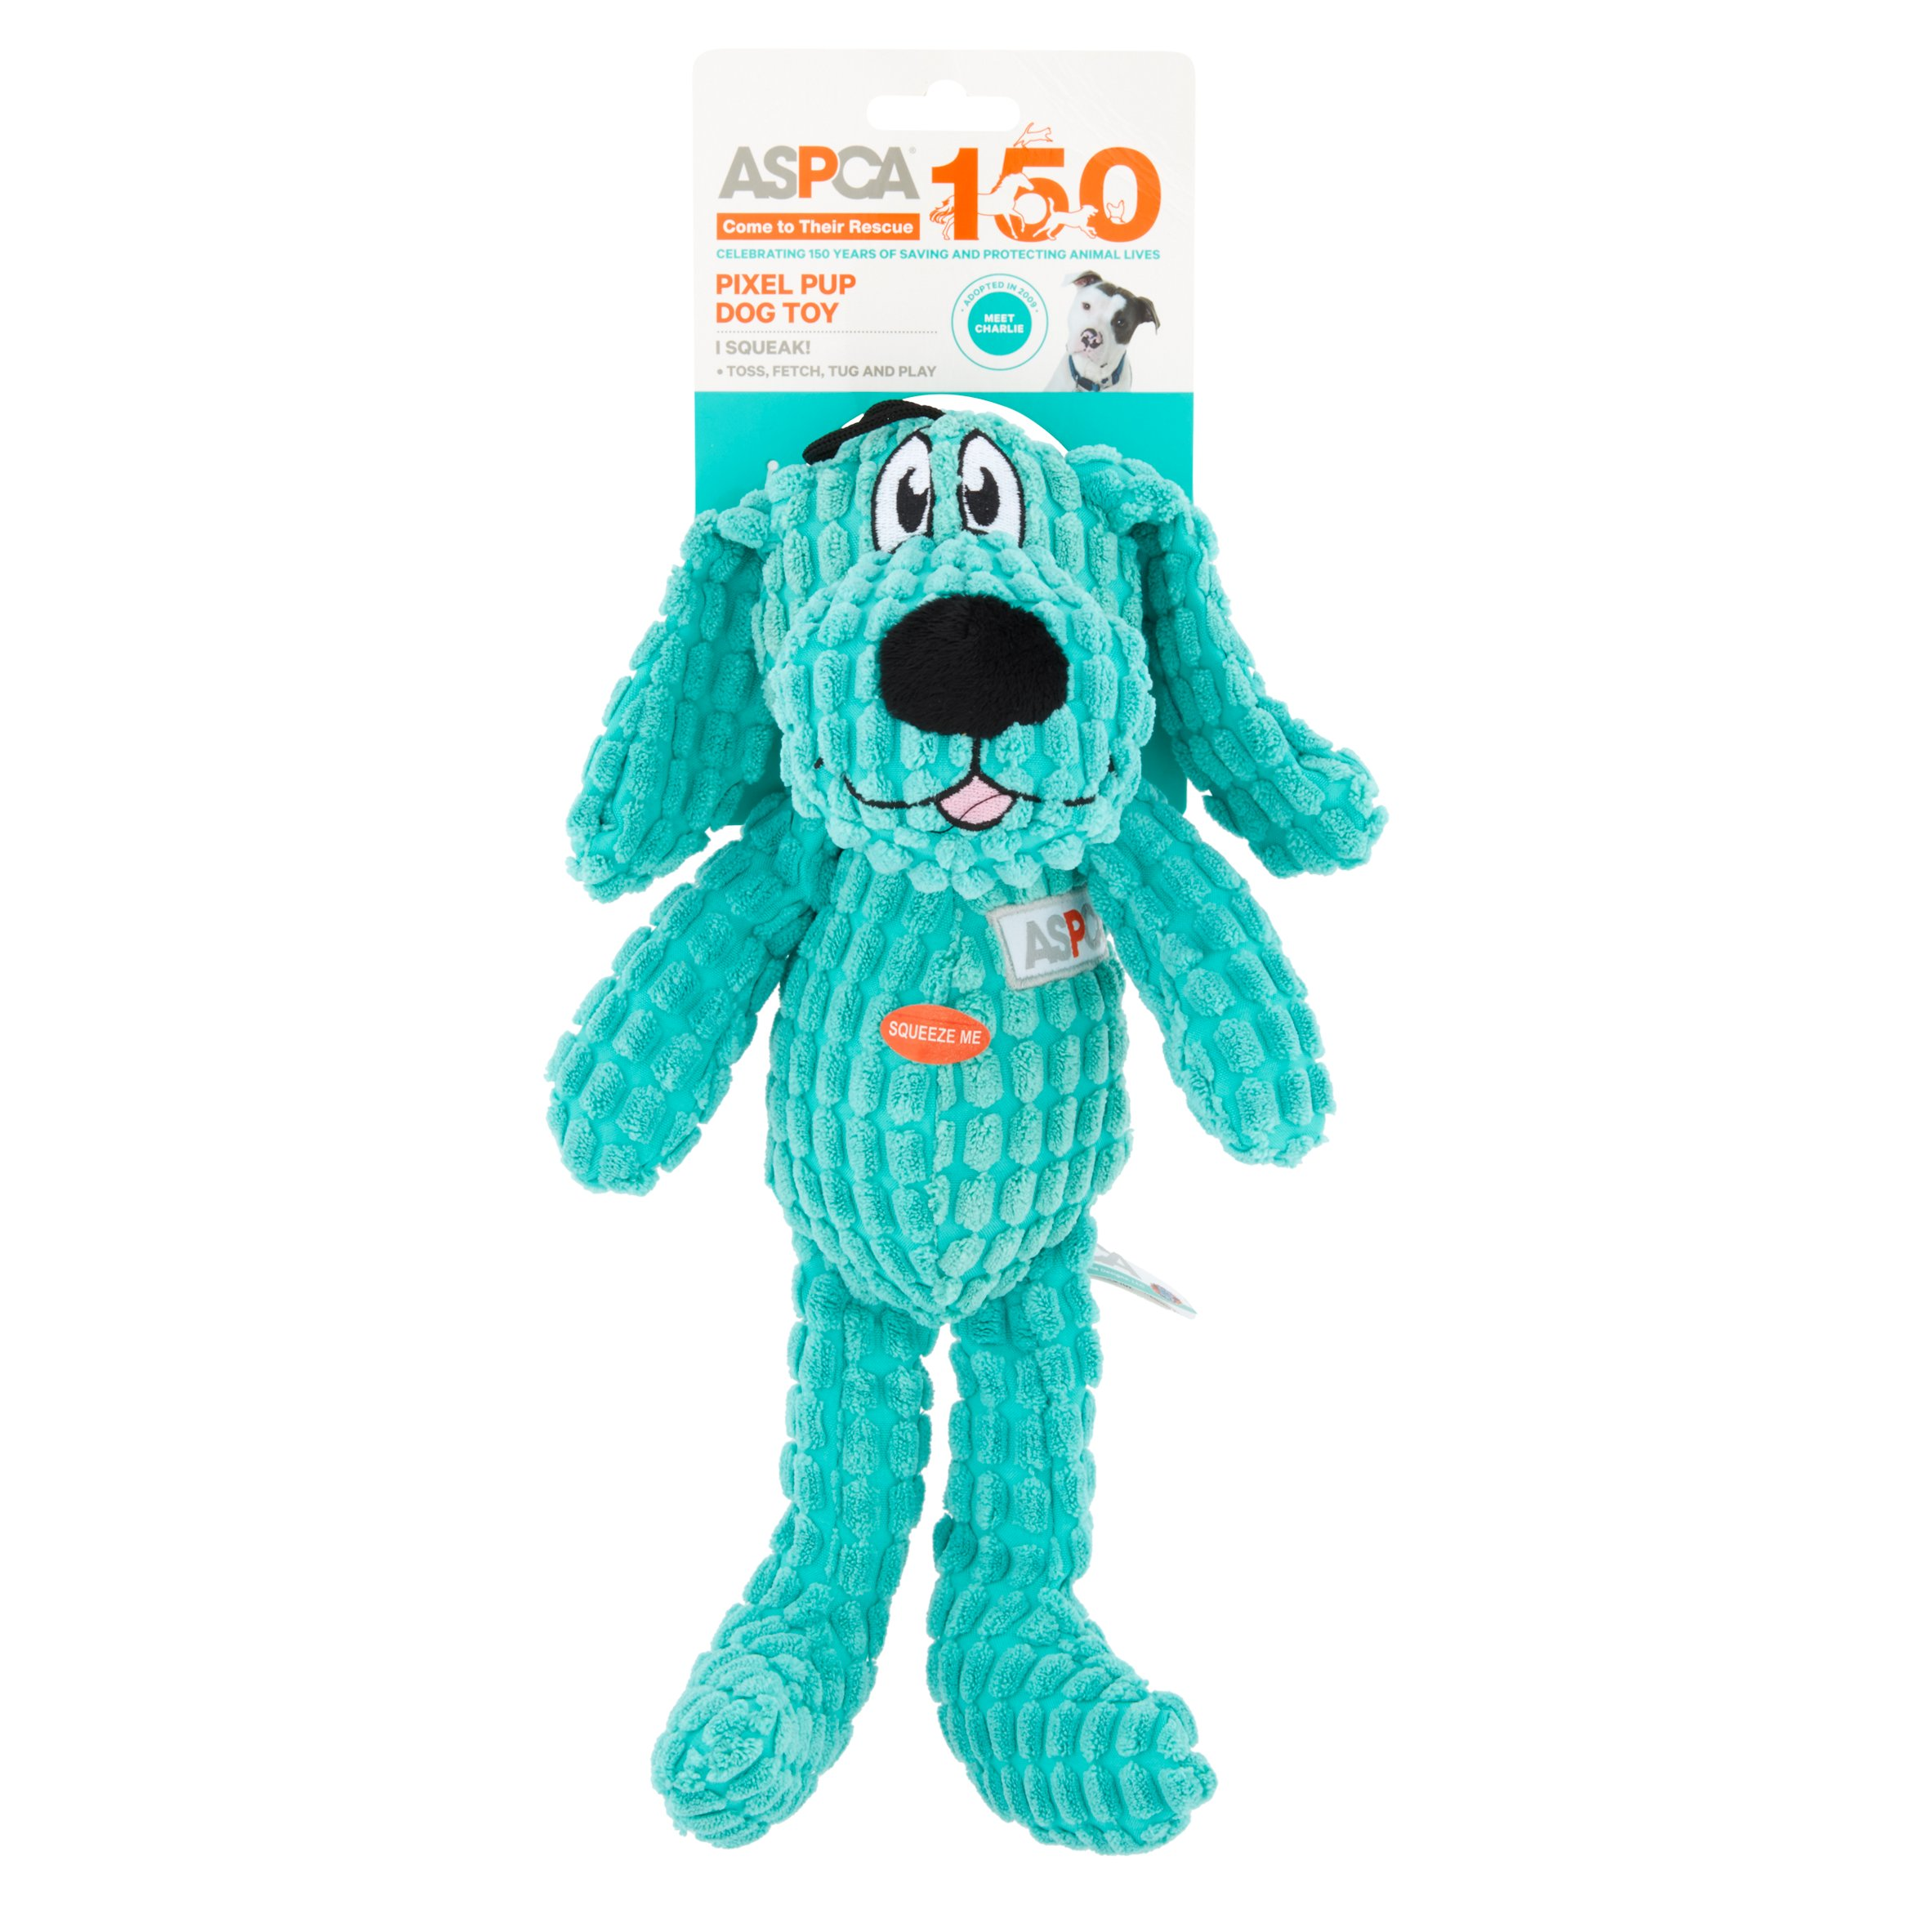 ASPCA Pixel Pup Dog Toy